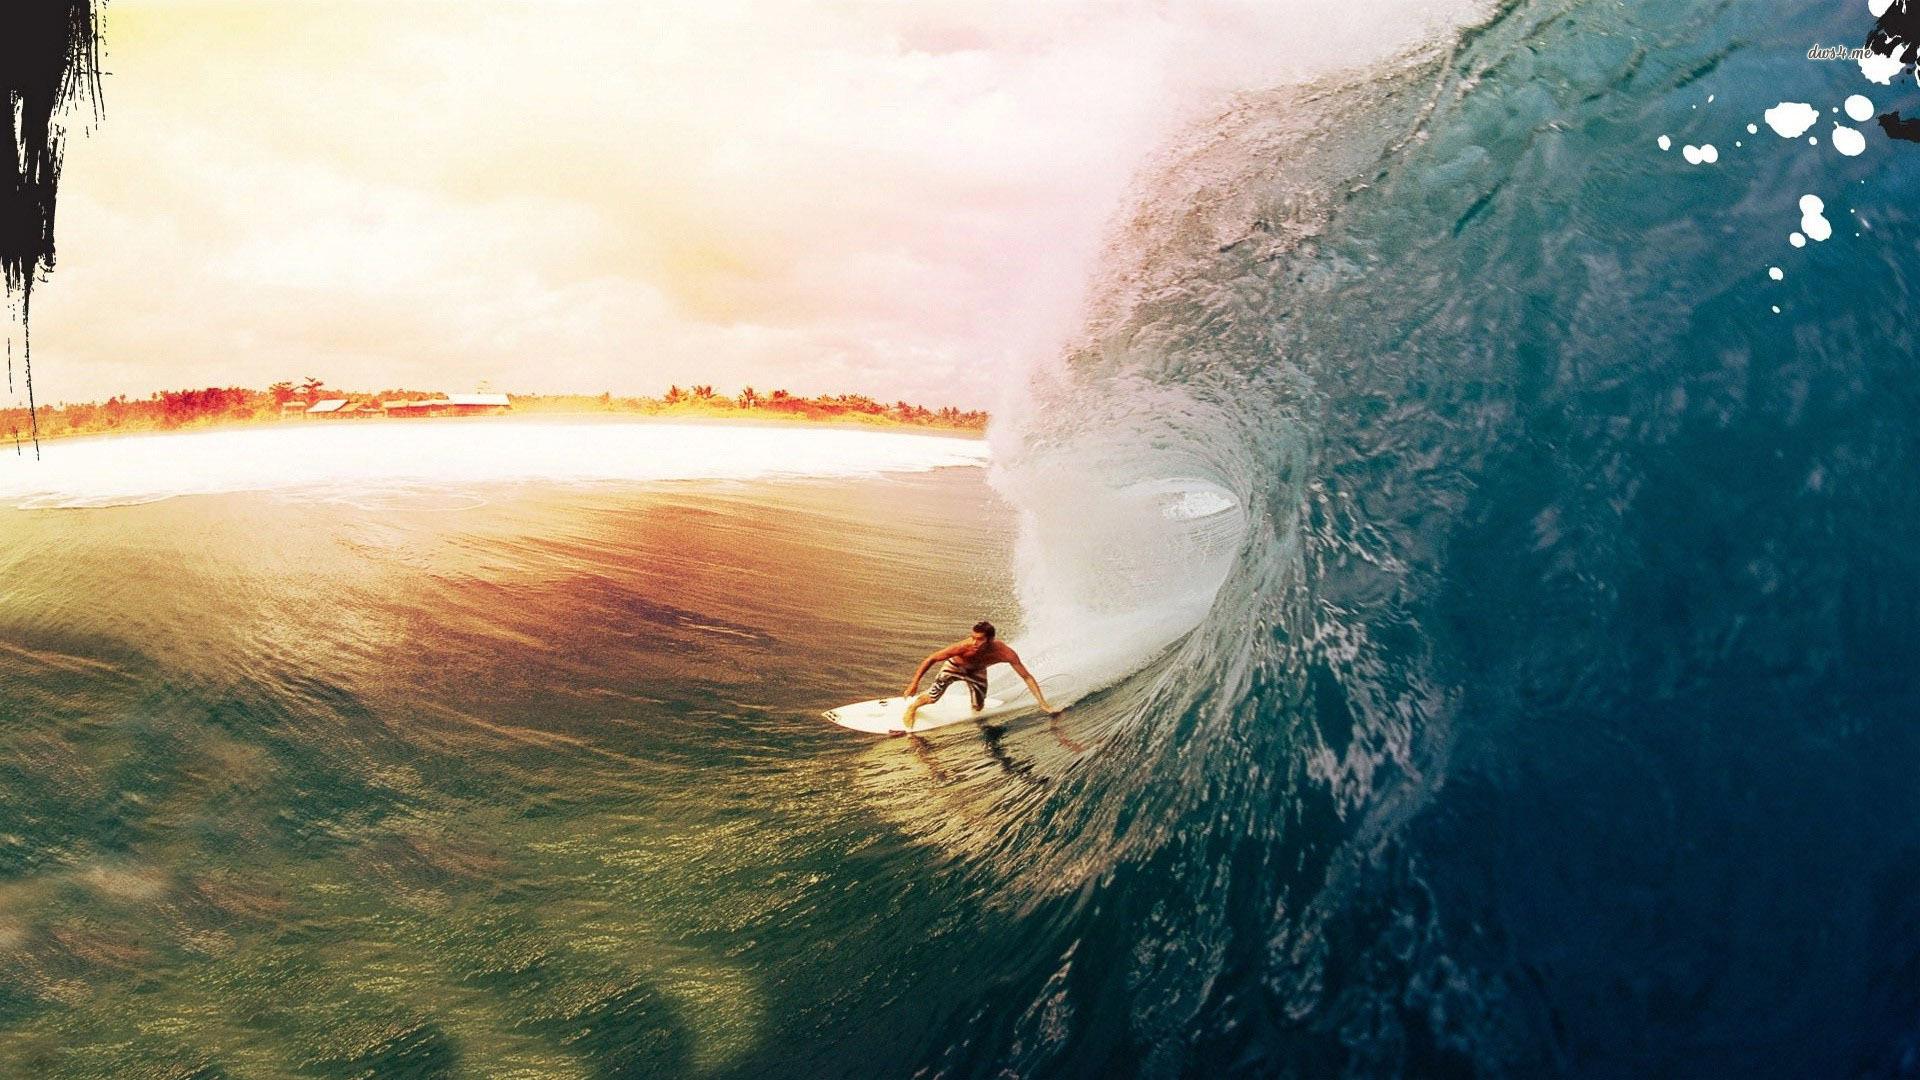 ... Surfer wallpaper 1920x1080 ...